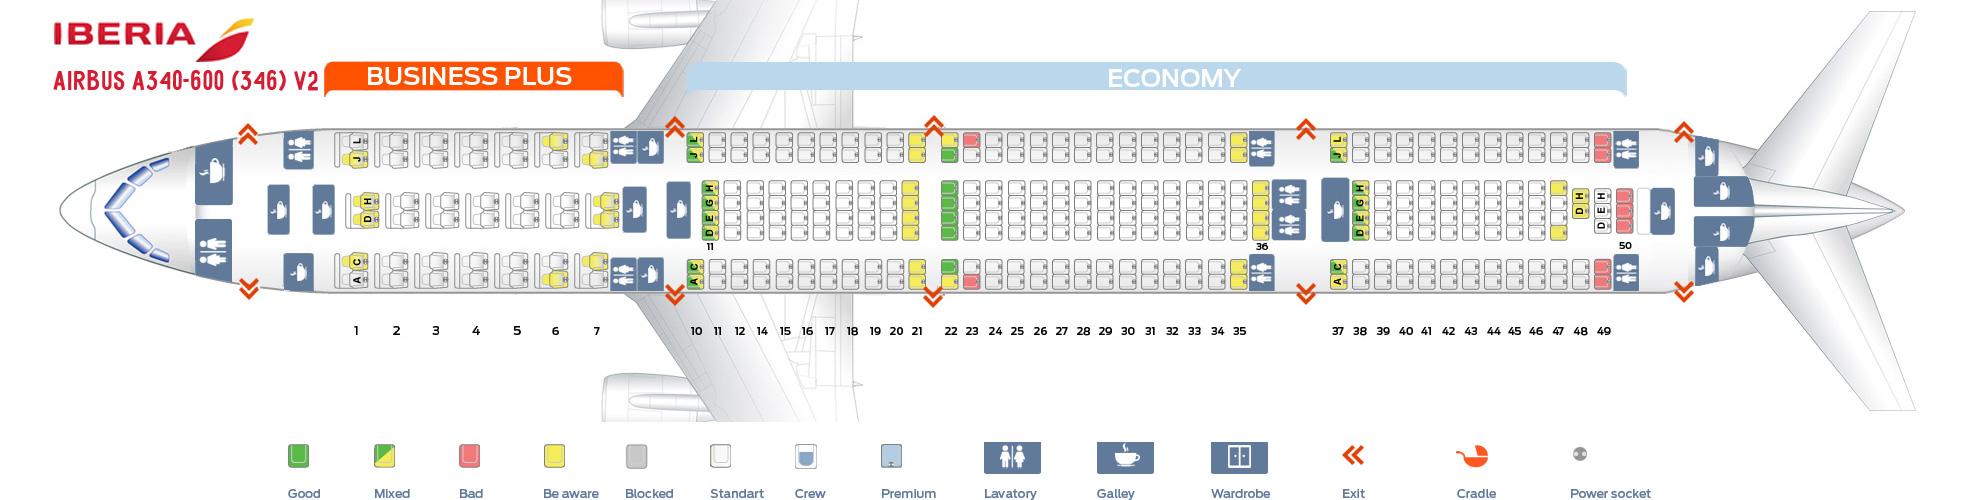 Seat Map Airbus A340-600 V2 Iberia